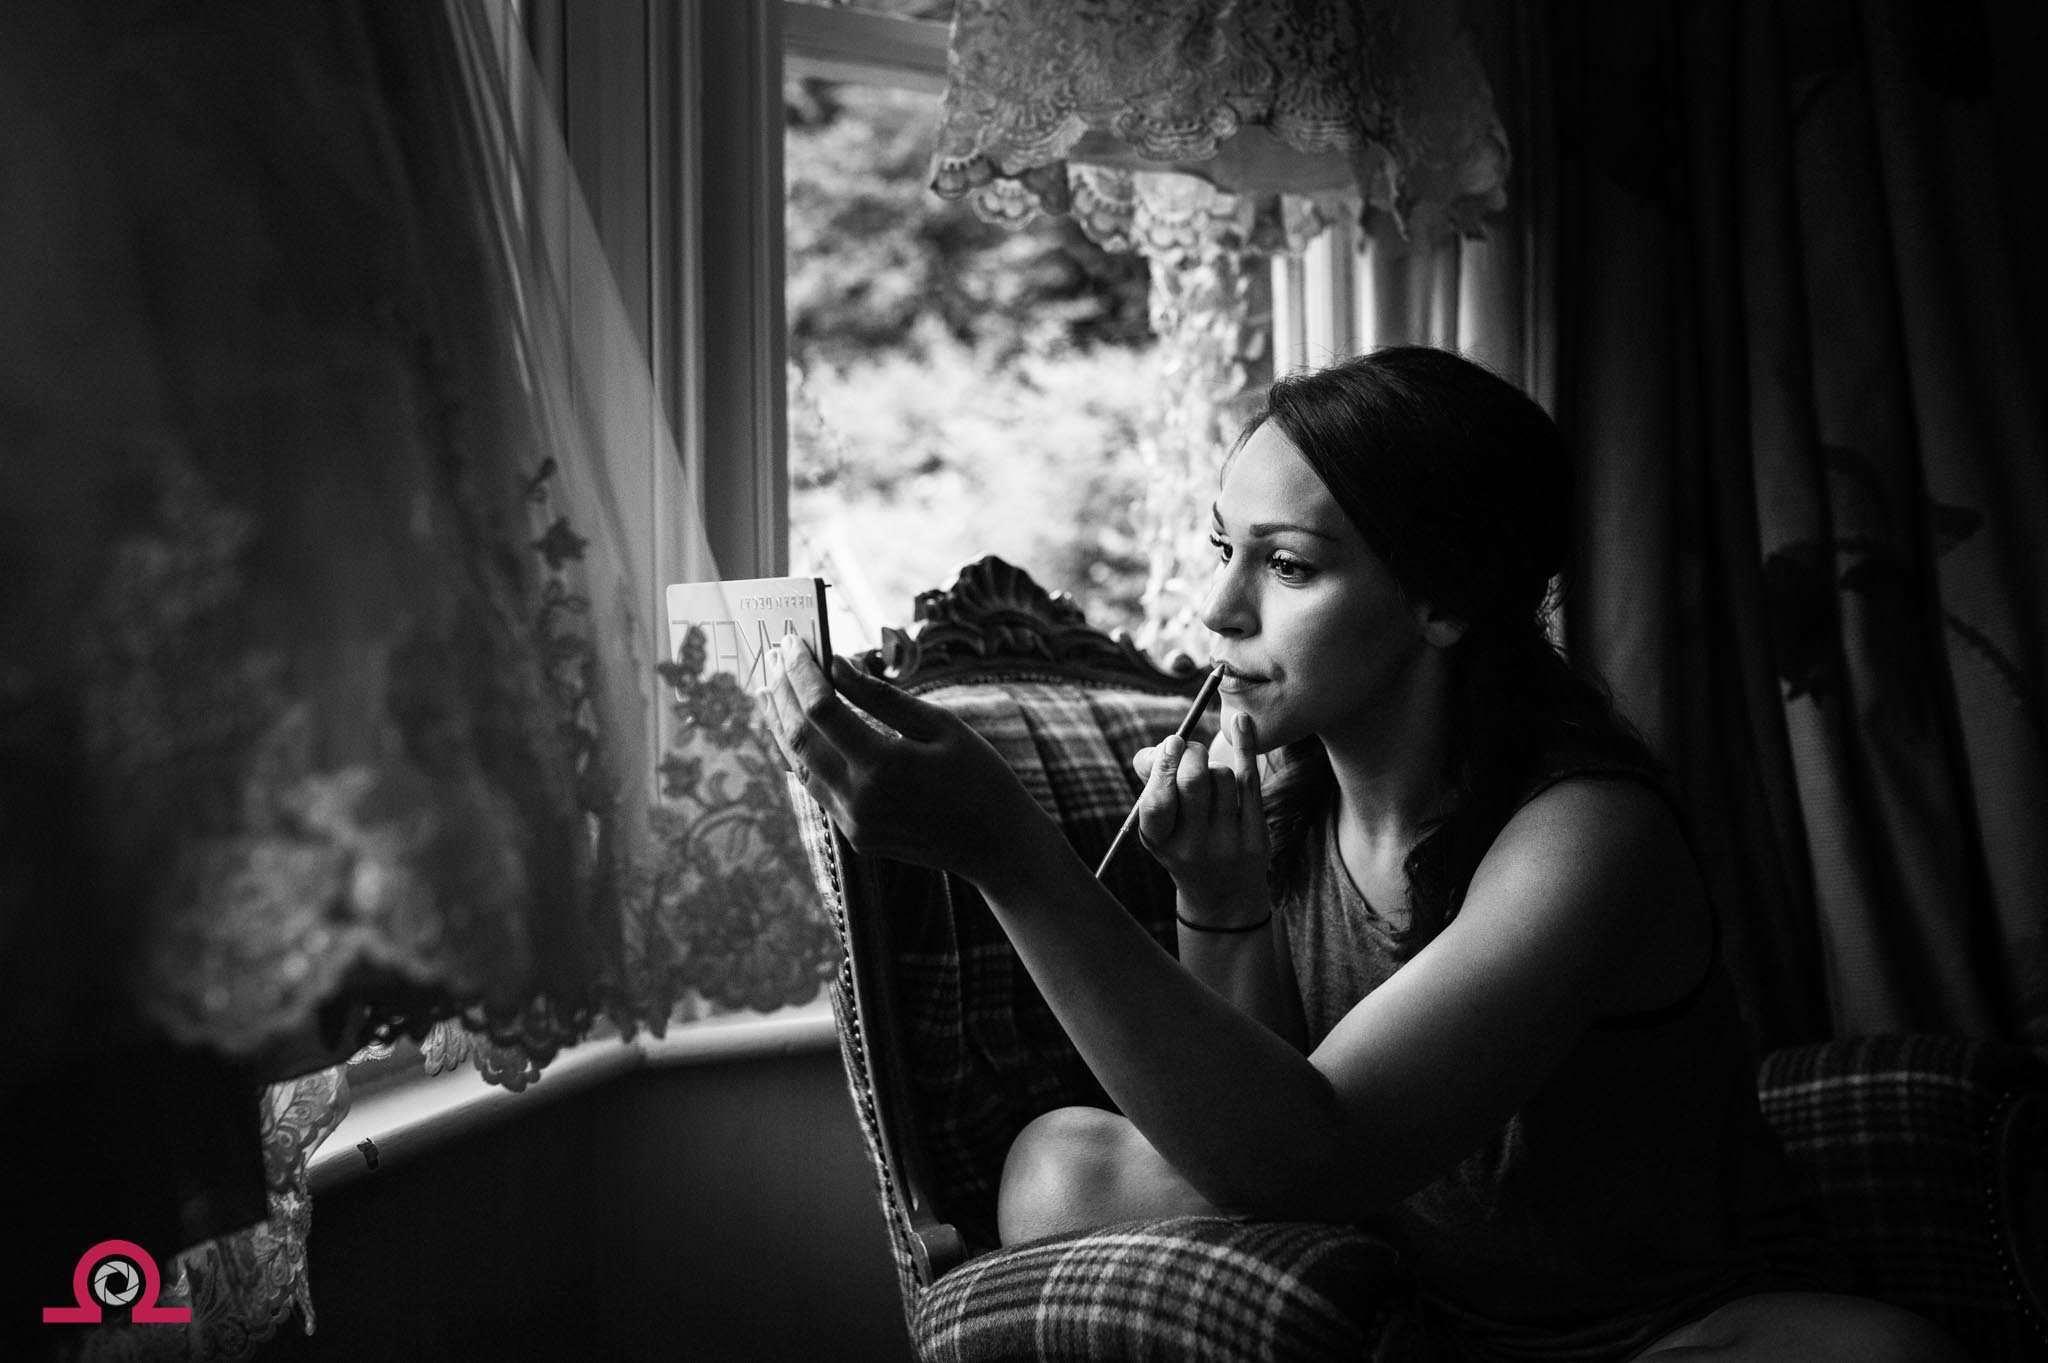 Bride applying her makeup in the window -Larmertree Wedding